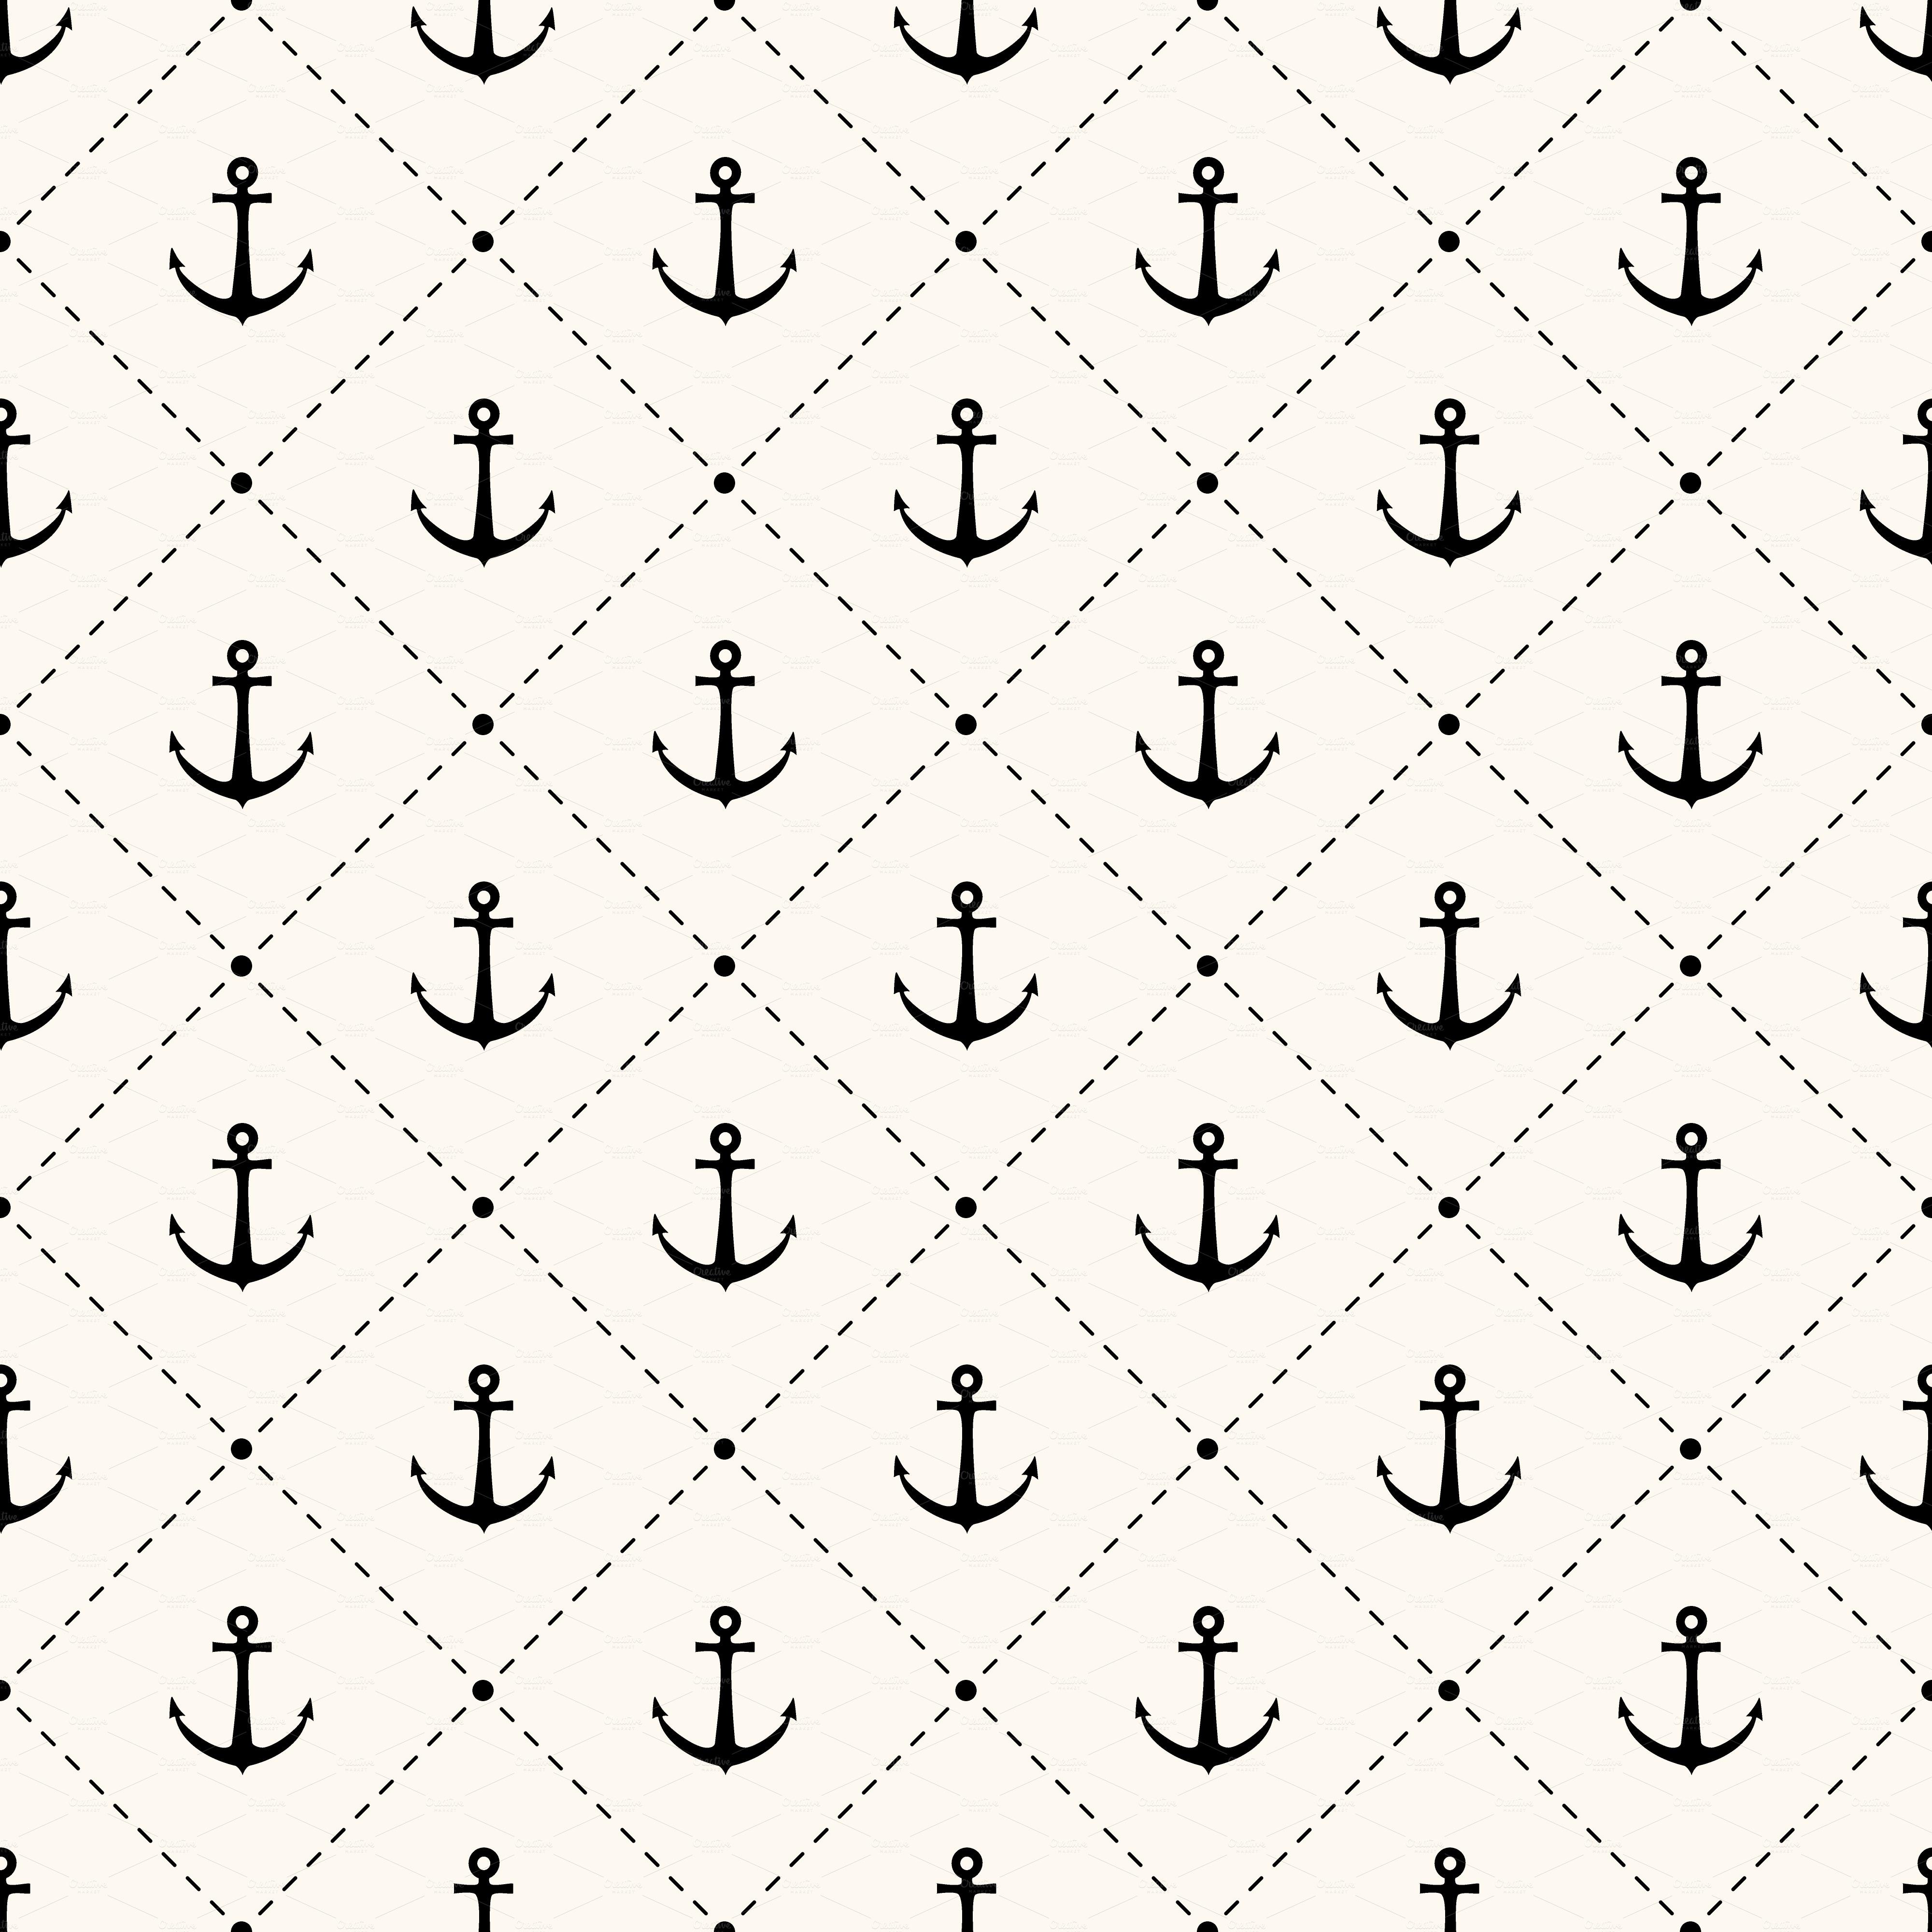 Anchor iphone wallpaper tumblr - Cute Anchor Backgrounds Anchor4 O Jpg 1384751953